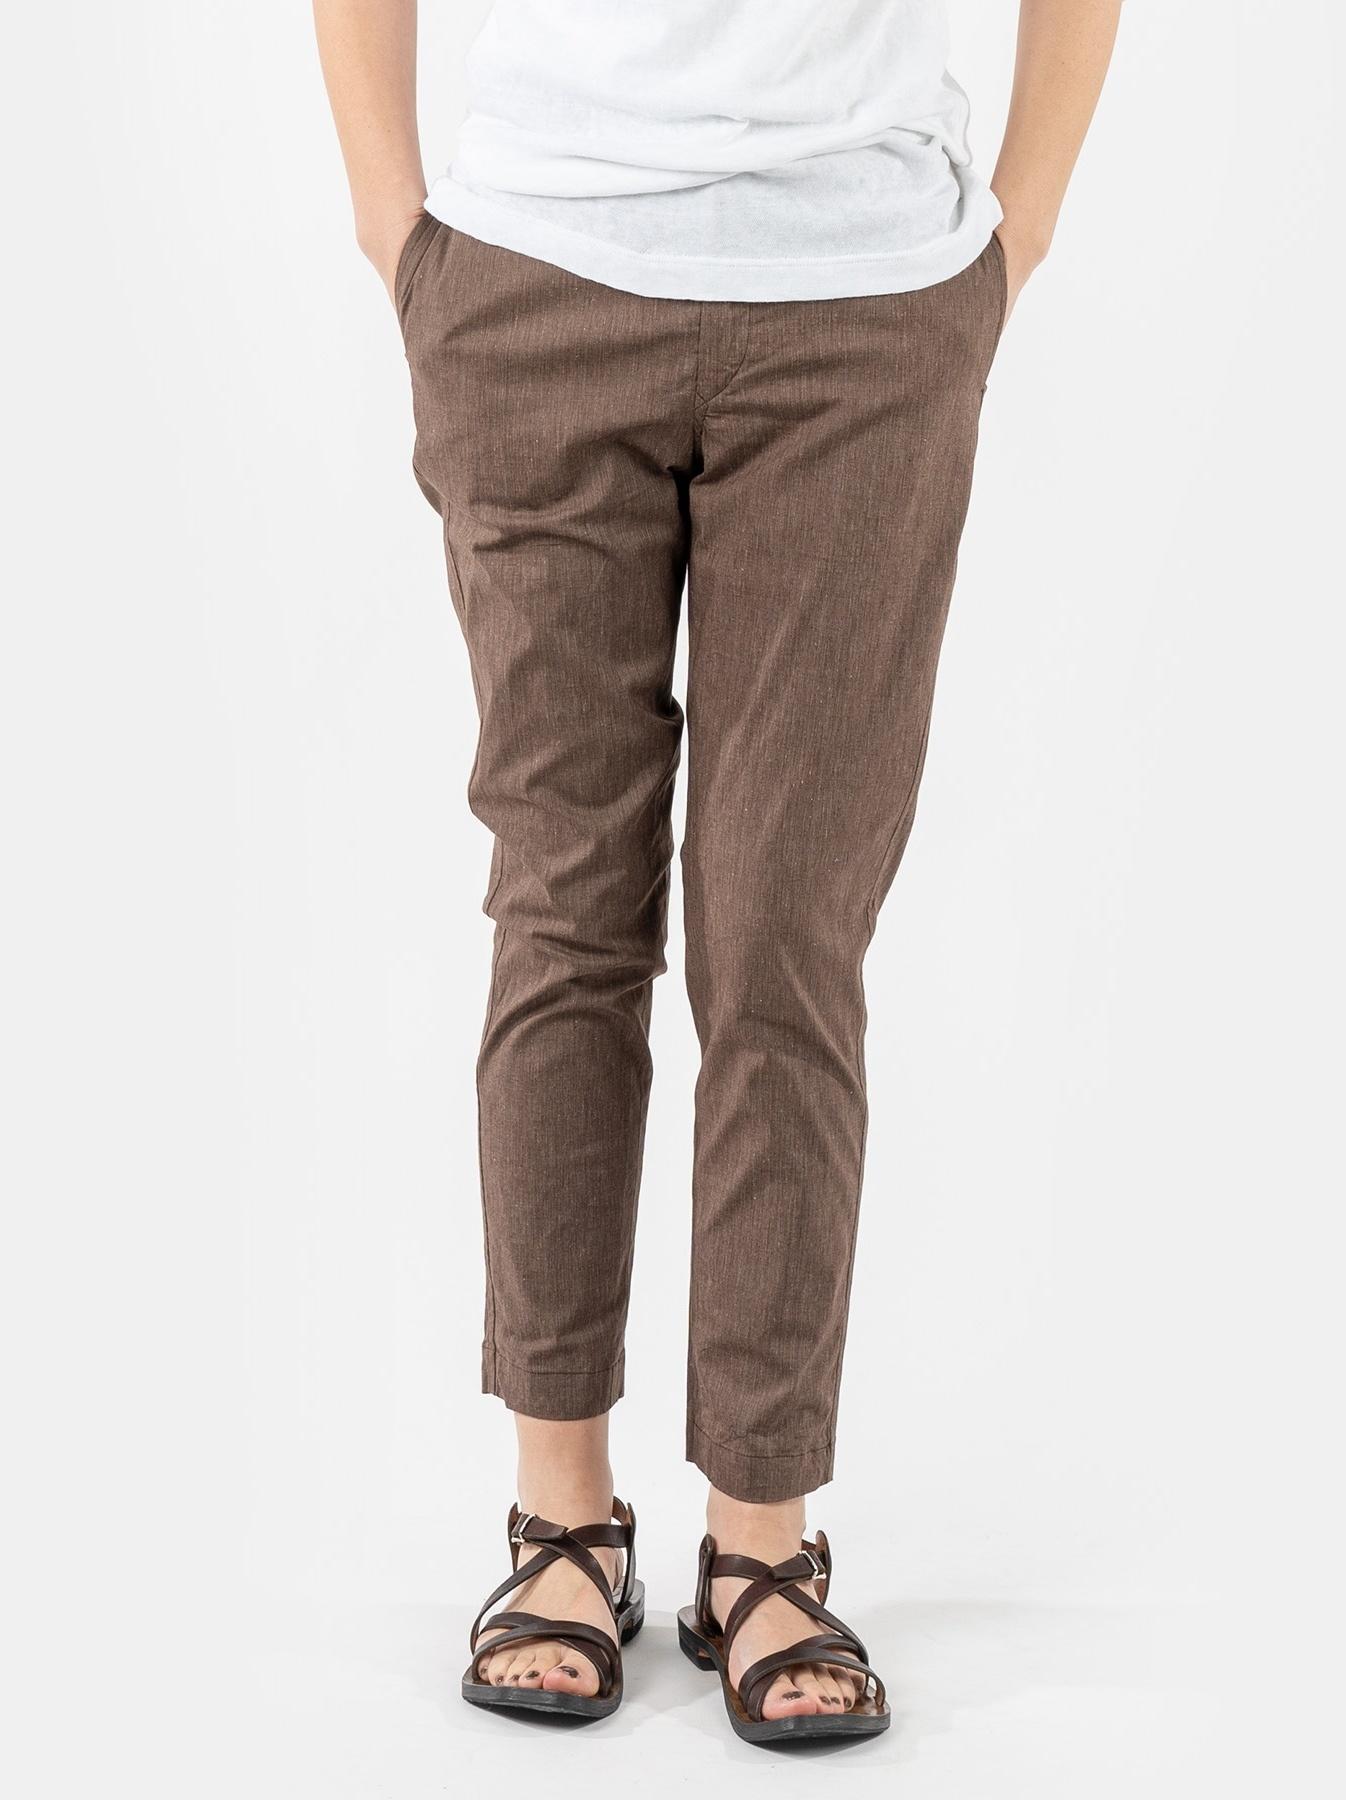 WH Cotton Linen Hakeme Stretch Pants-3